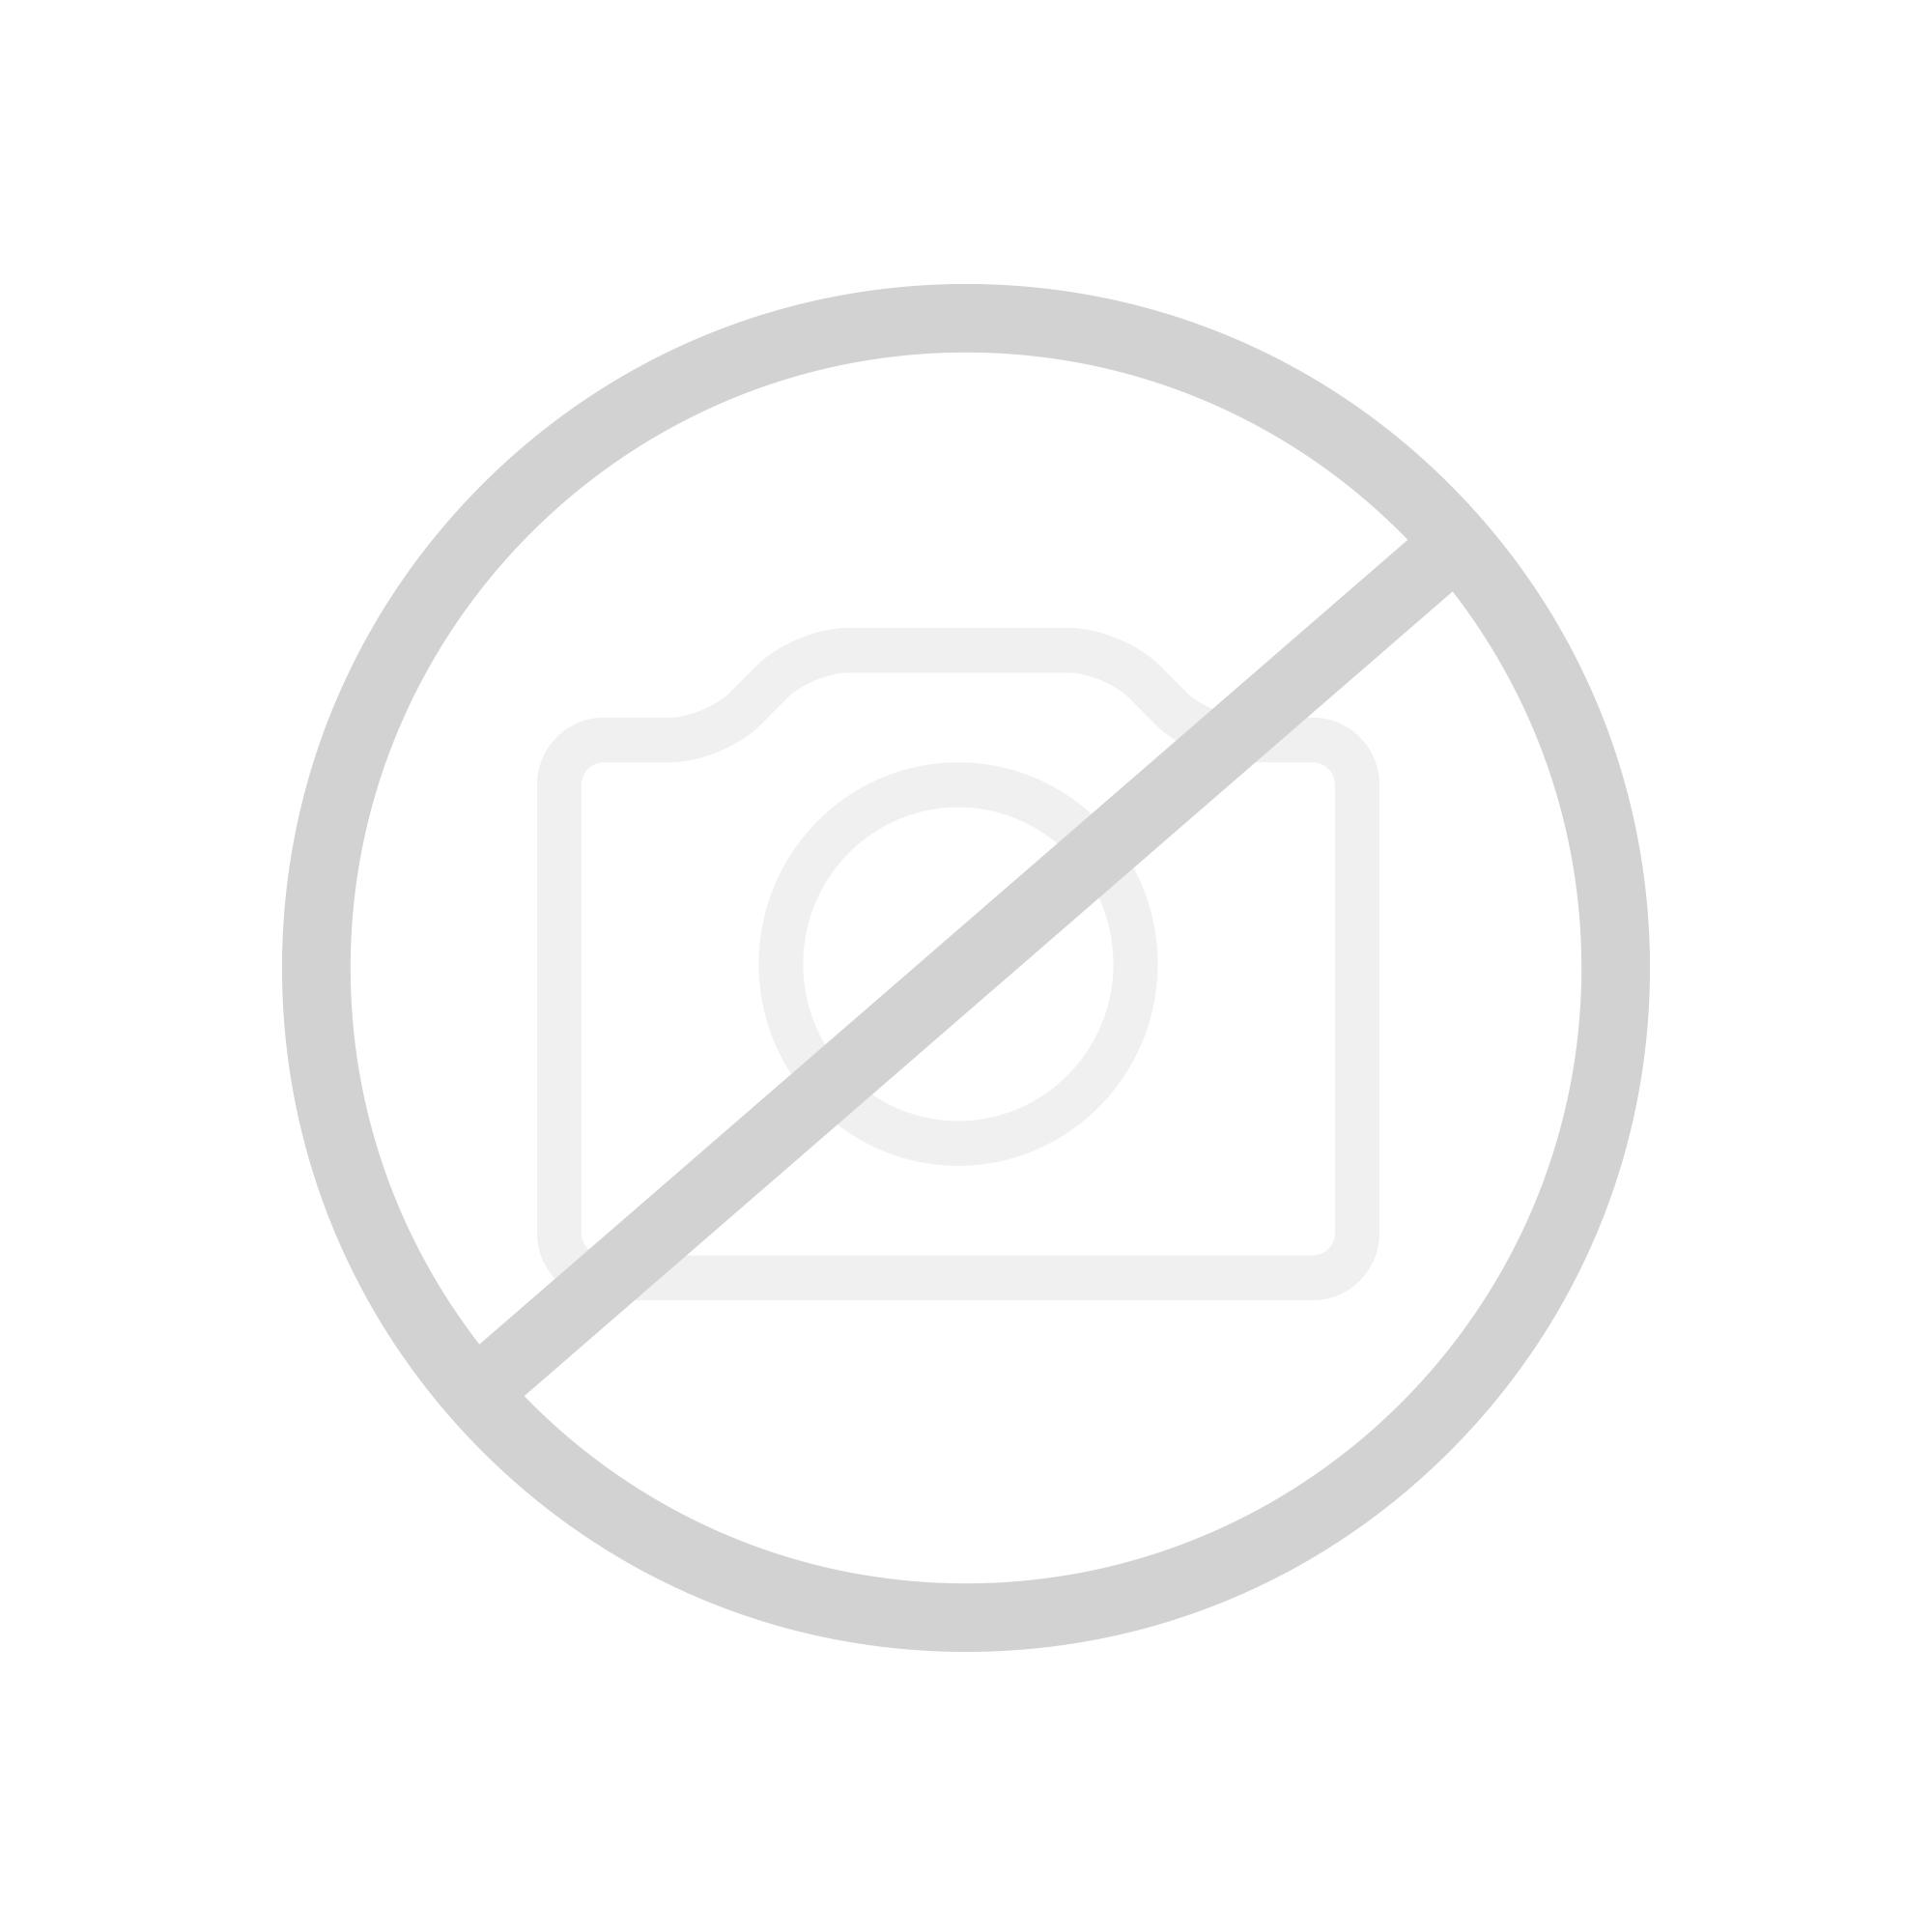 hansgrohe raindance select e 120 unica combi 650 mm dn 15 chrom 27038000 reuter onlineshop. Black Bedroom Furniture Sets. Home Design Ideas